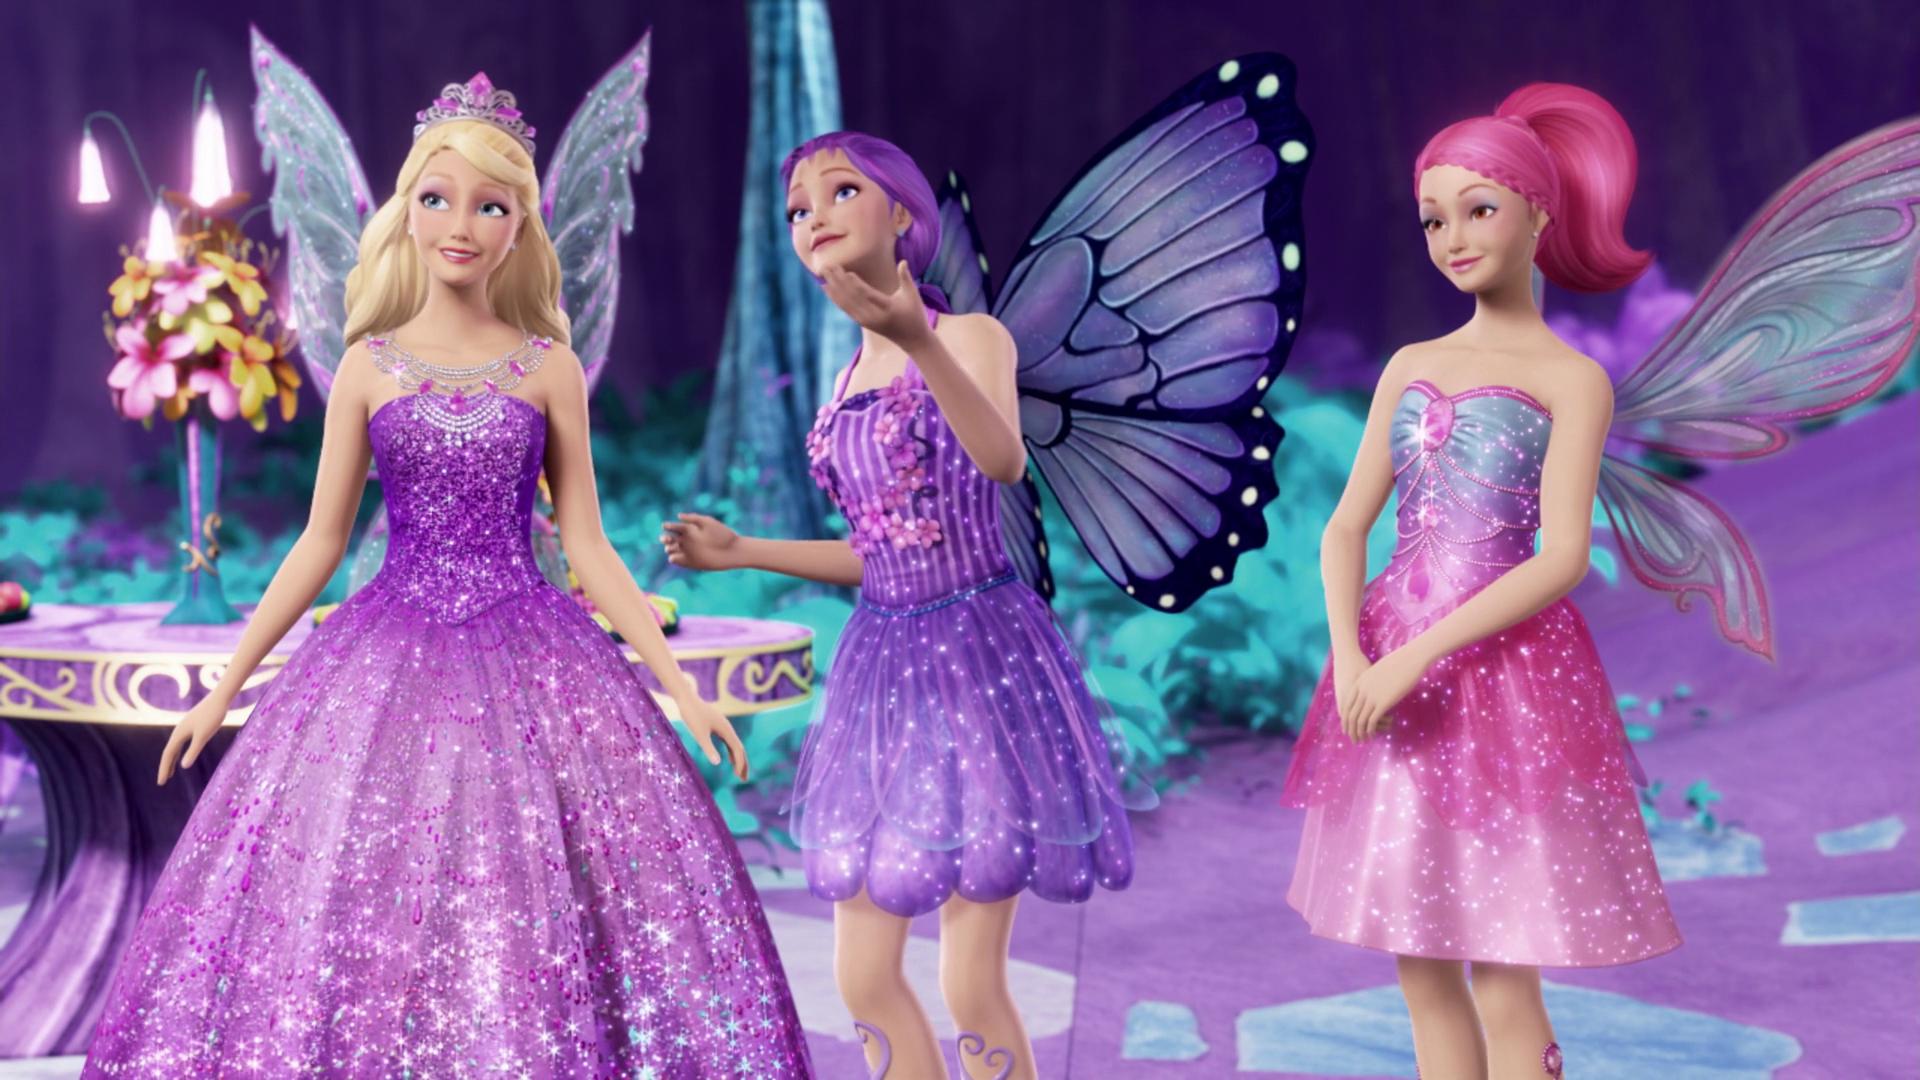 Barbie dolls birthday dress beautifull barbie doll clothes hd wallpaper free download barbie dolls birthday dress beautifull barbie doll clothes voltagebd Gallery